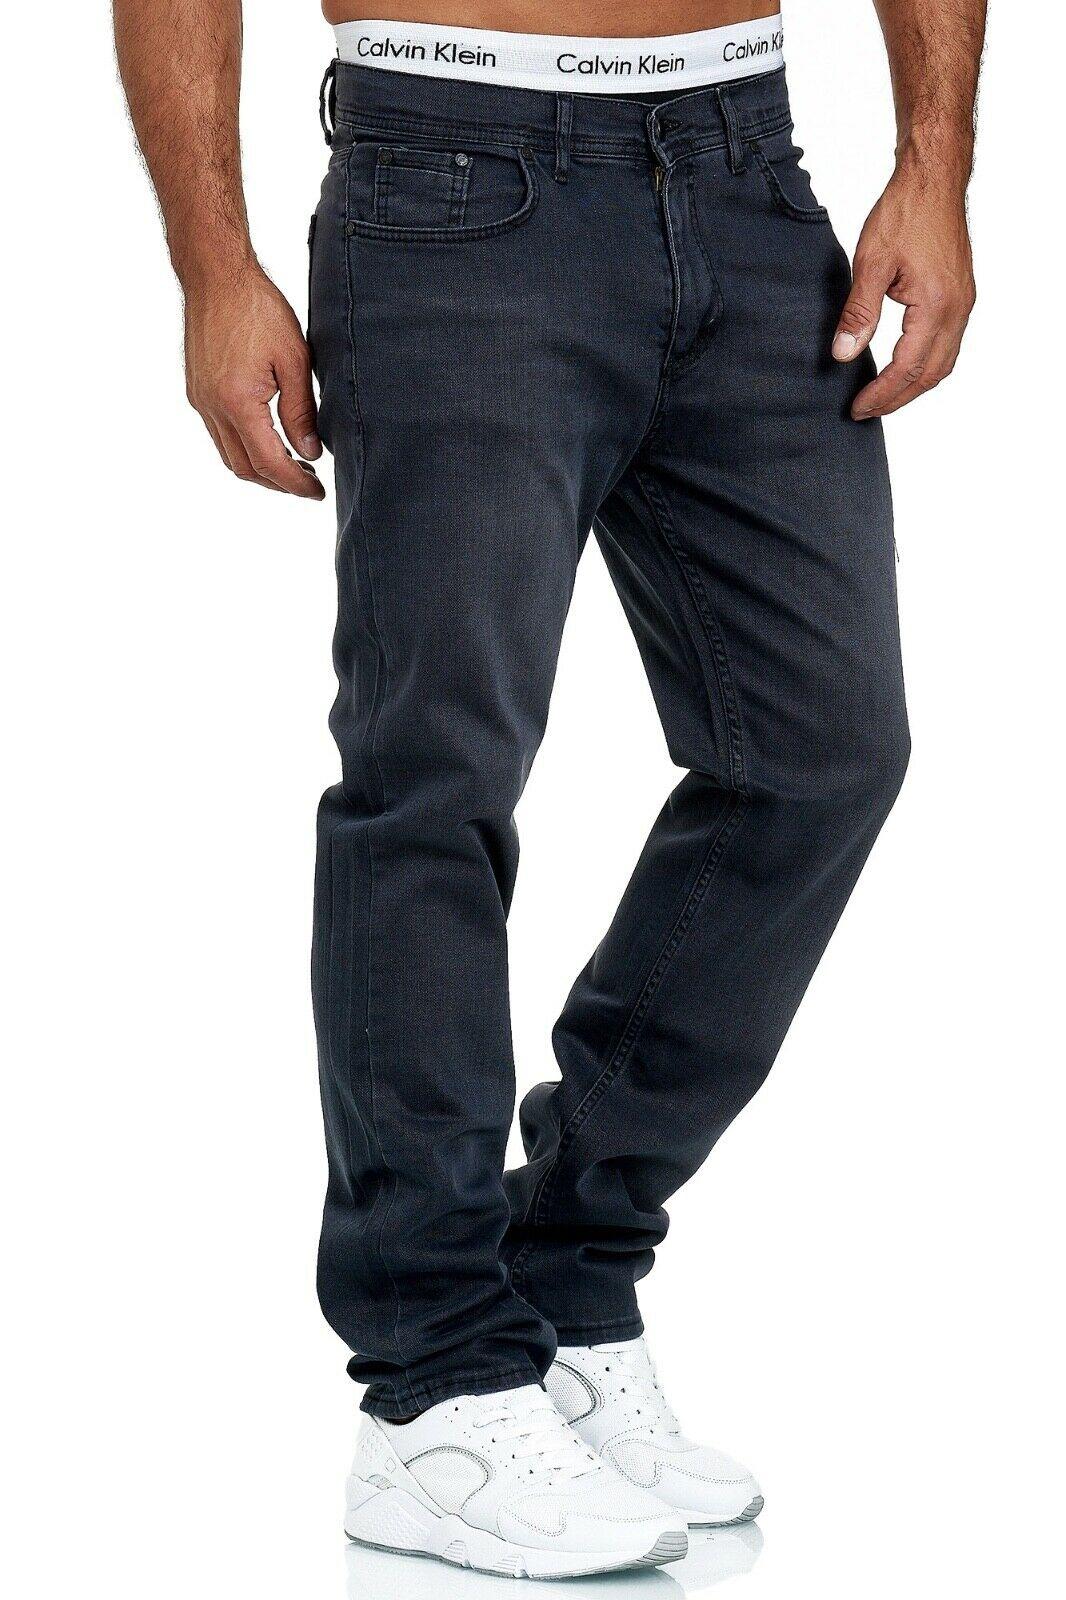 Herren-Jeans-Hose-Denim-KC-Black-Washed-Straight-Cut-Regular-Dicke-Naht-naehte Indexbild 83